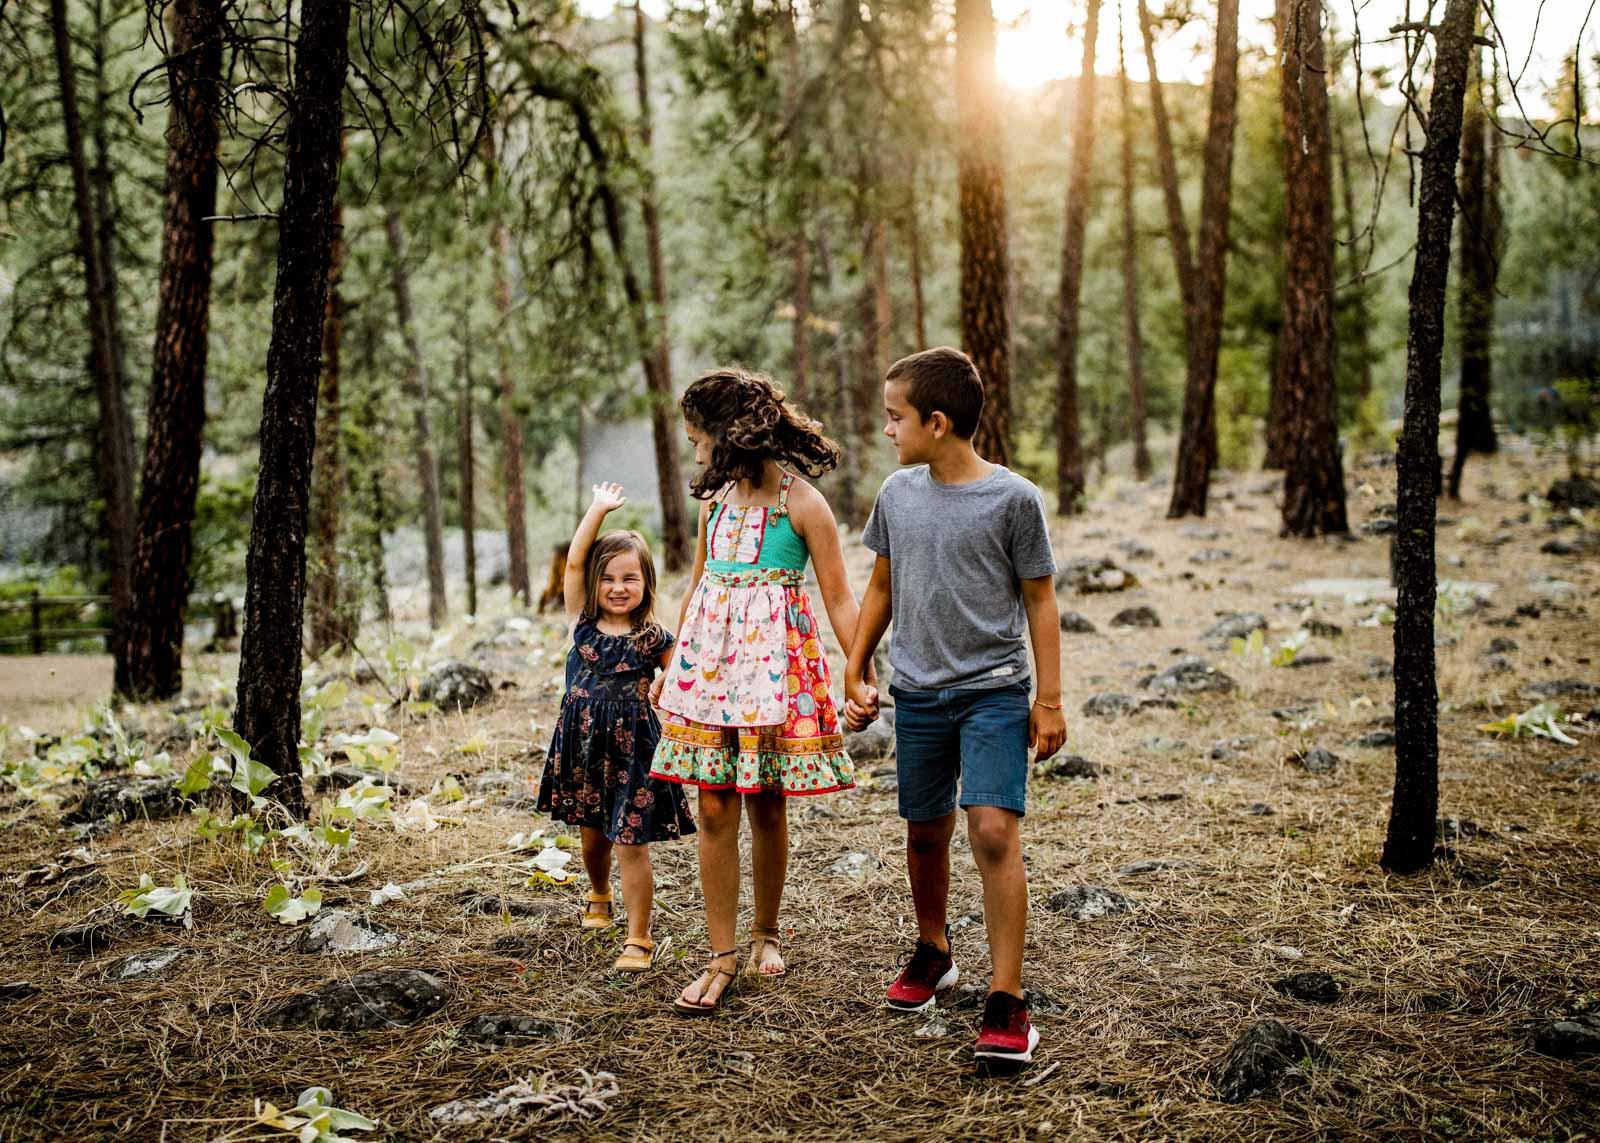 kids-walking-through-wooded-area-by-kelsey-farnham